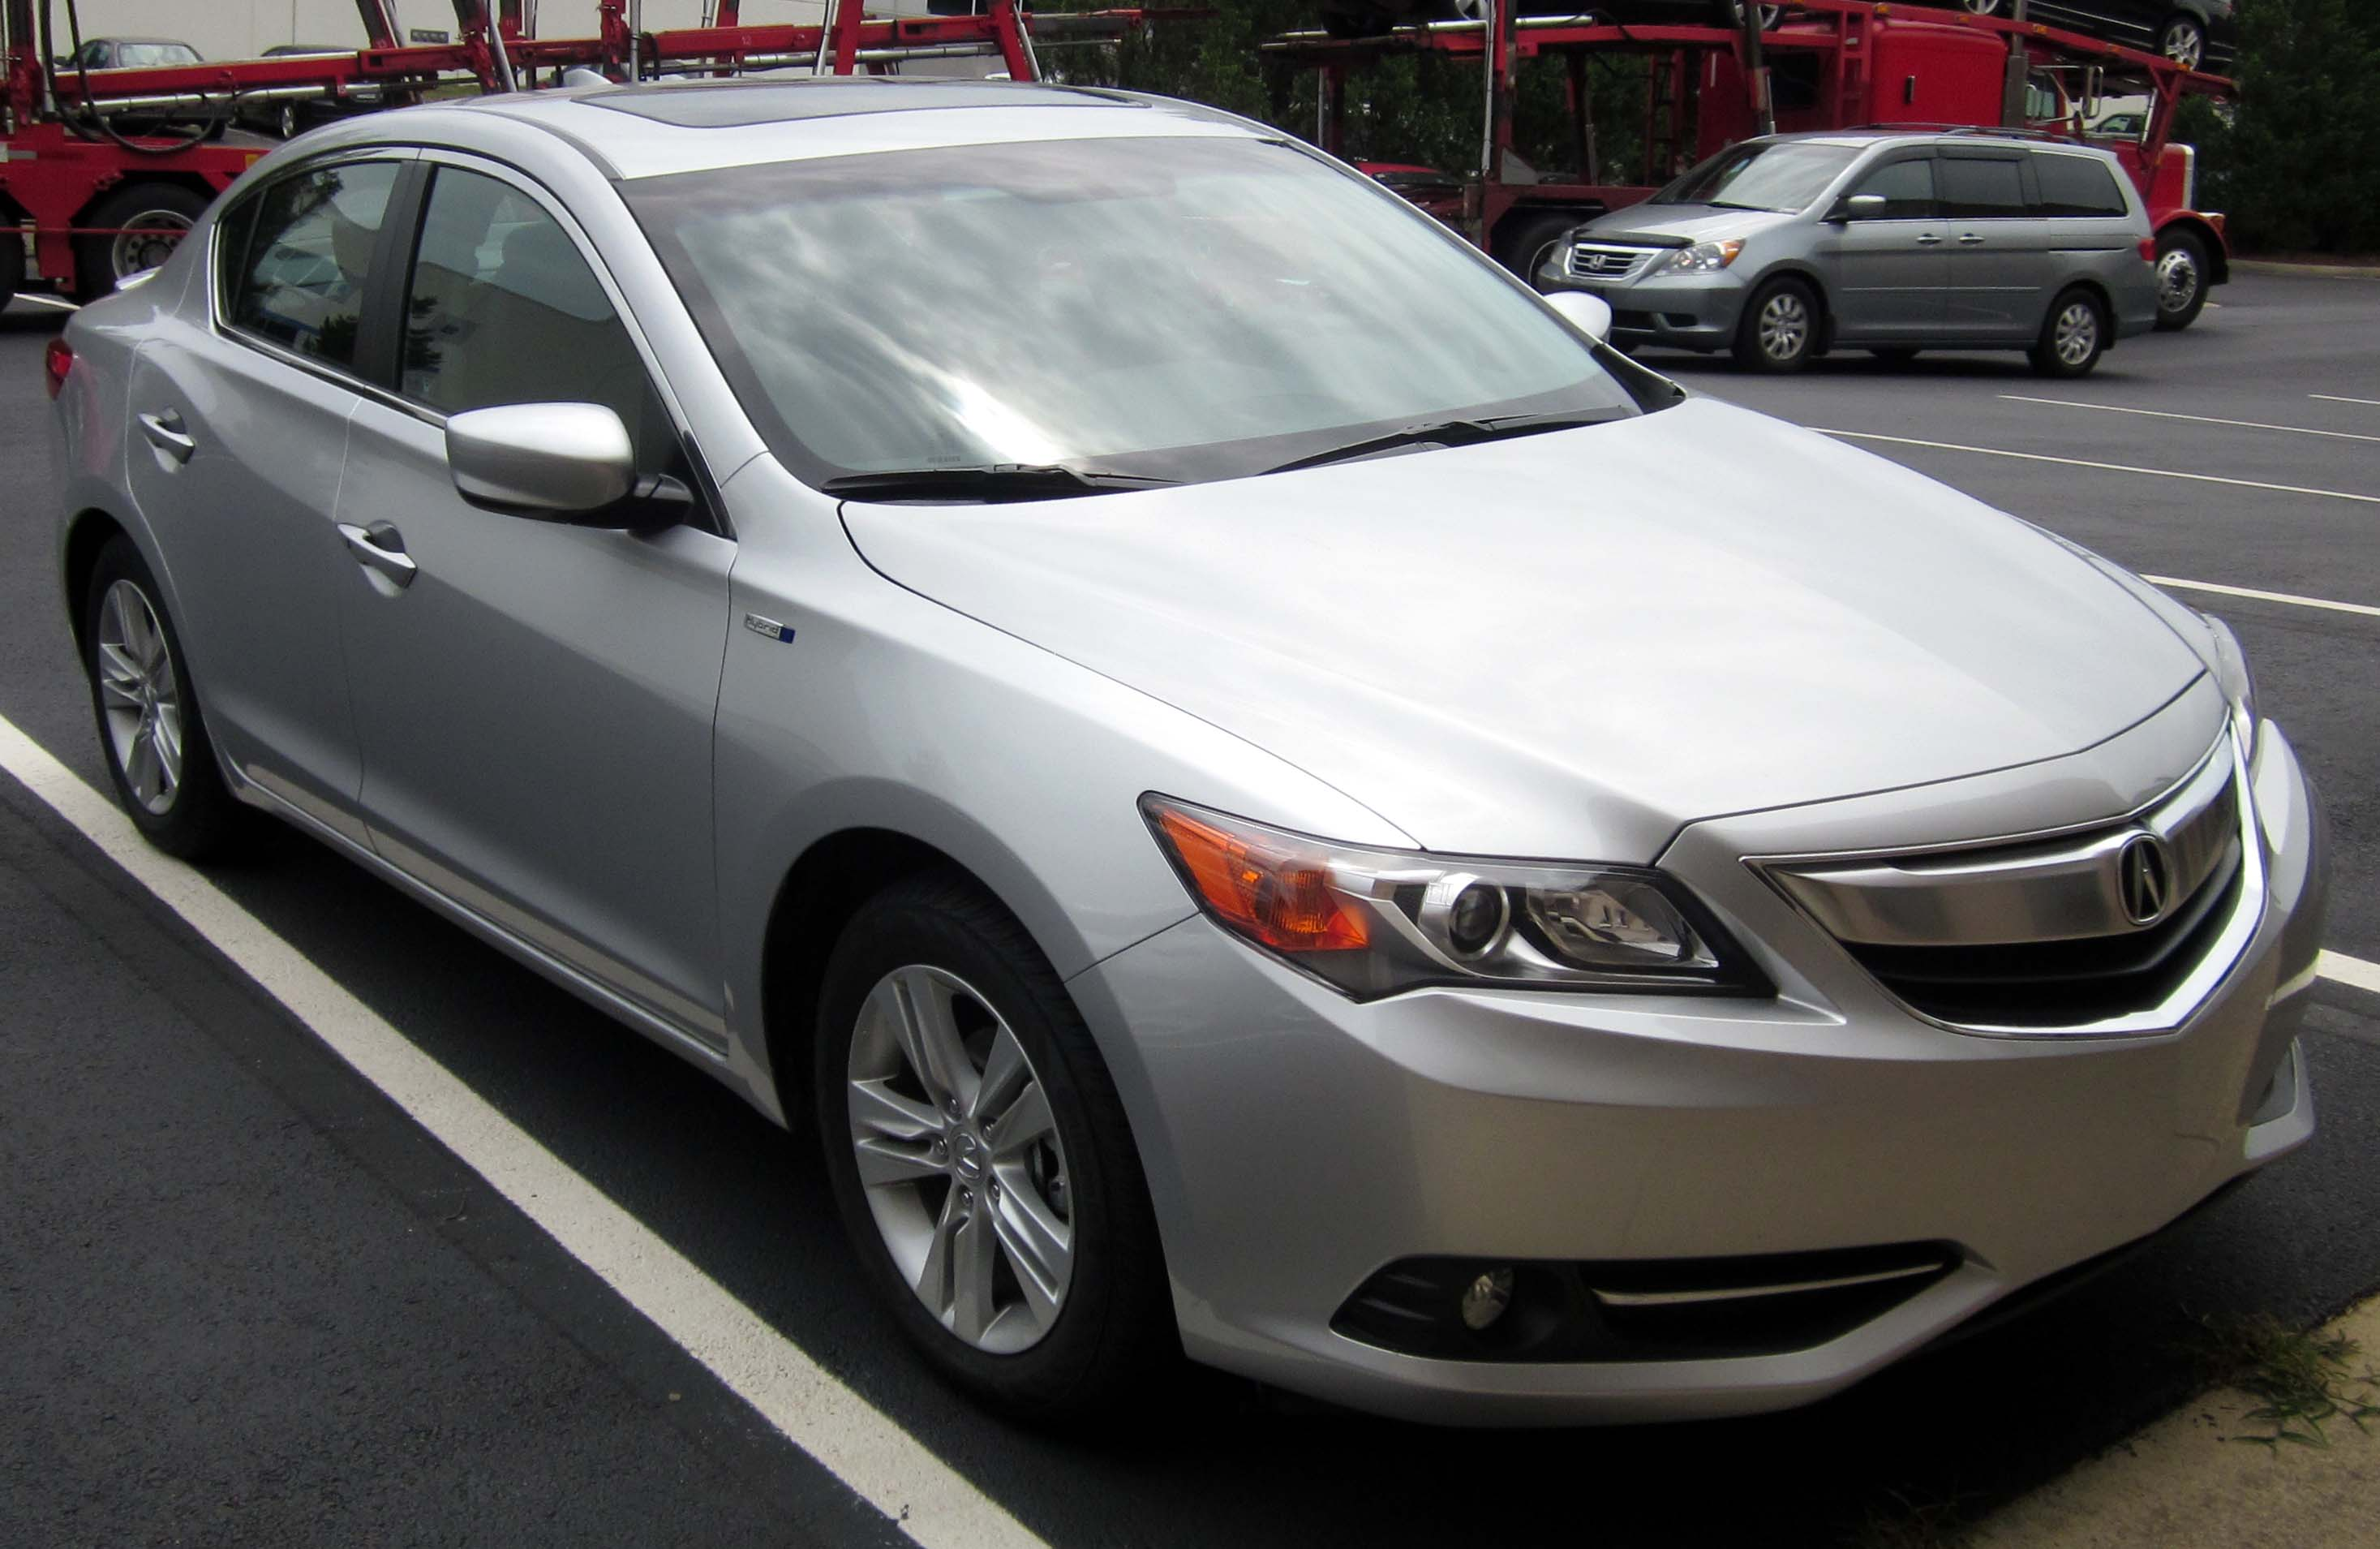 File:2013 Acura ILX Hybrid -- 07-13-2012.JPG - Wikimedia Commons